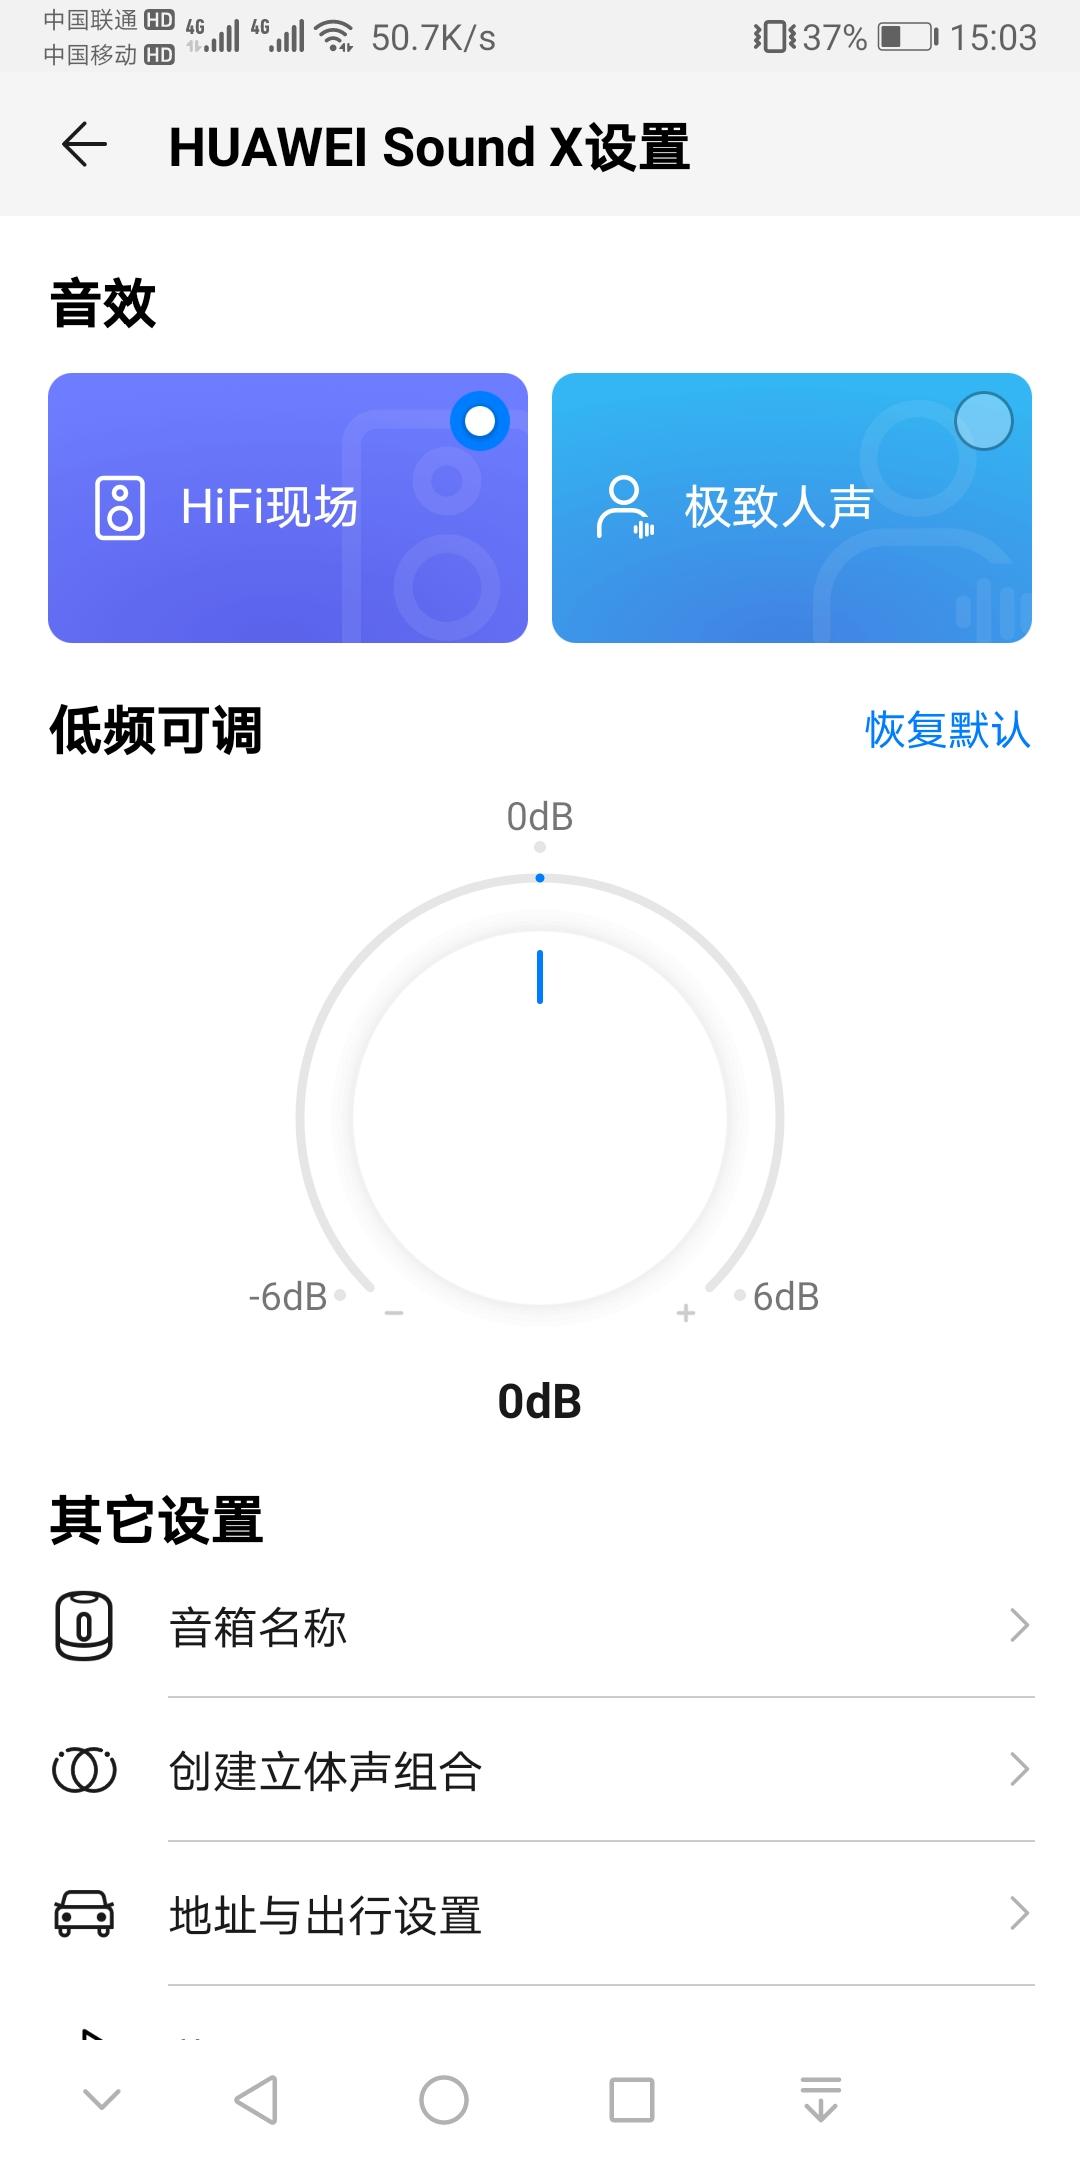 Screenshot_20200523_150345_com.huawei.smartspeaker.jpg